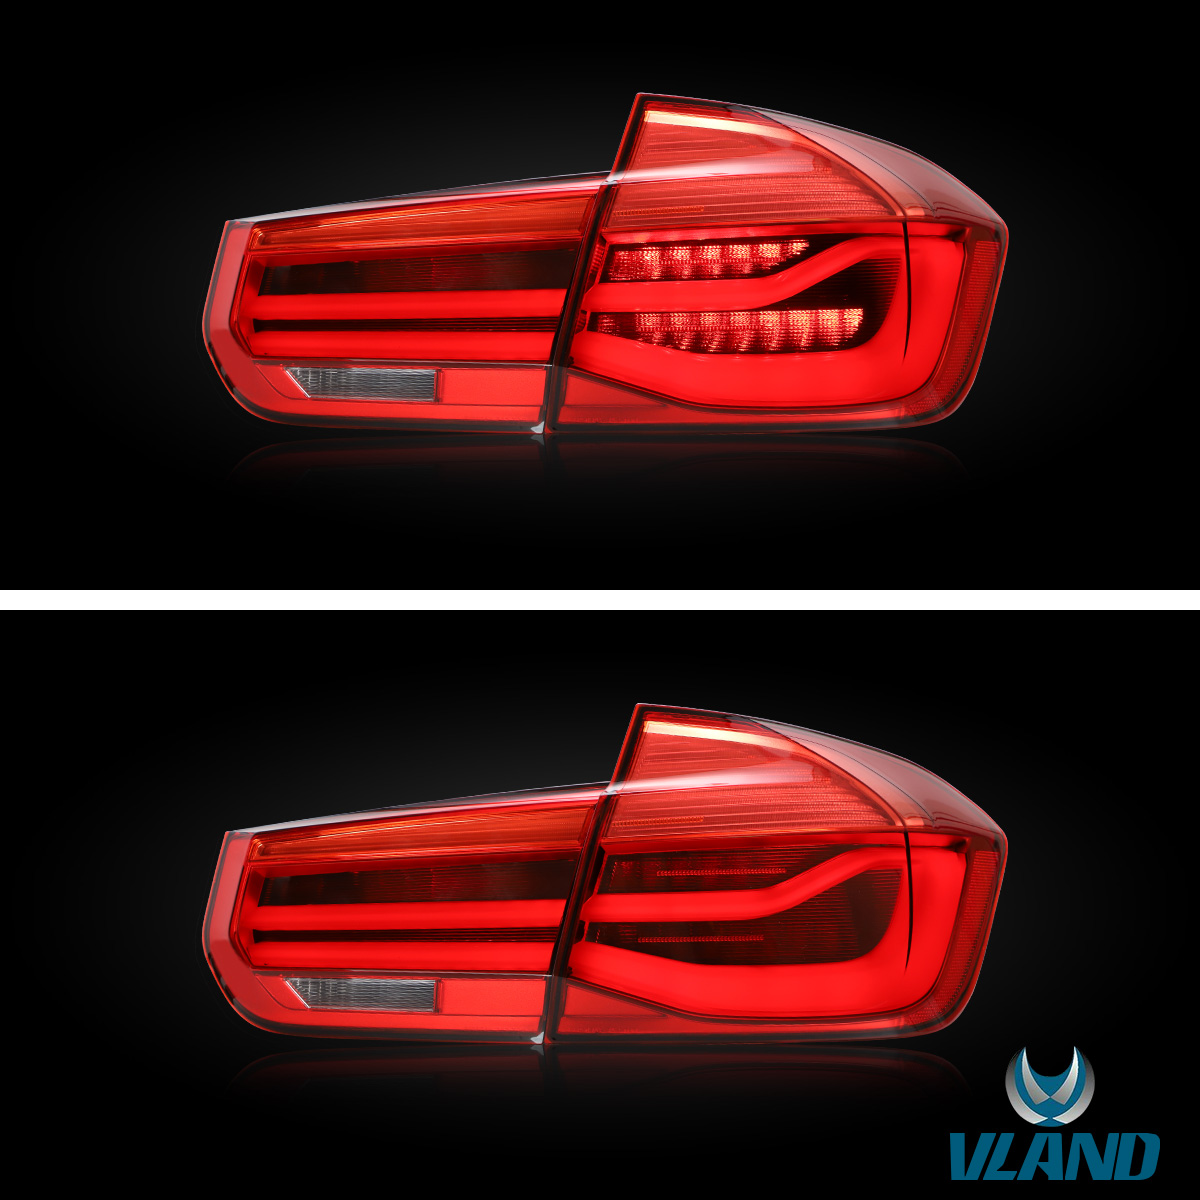 For 2012-2018 BMW F30 F35 F80 M3 Taillights Rear Lamp W